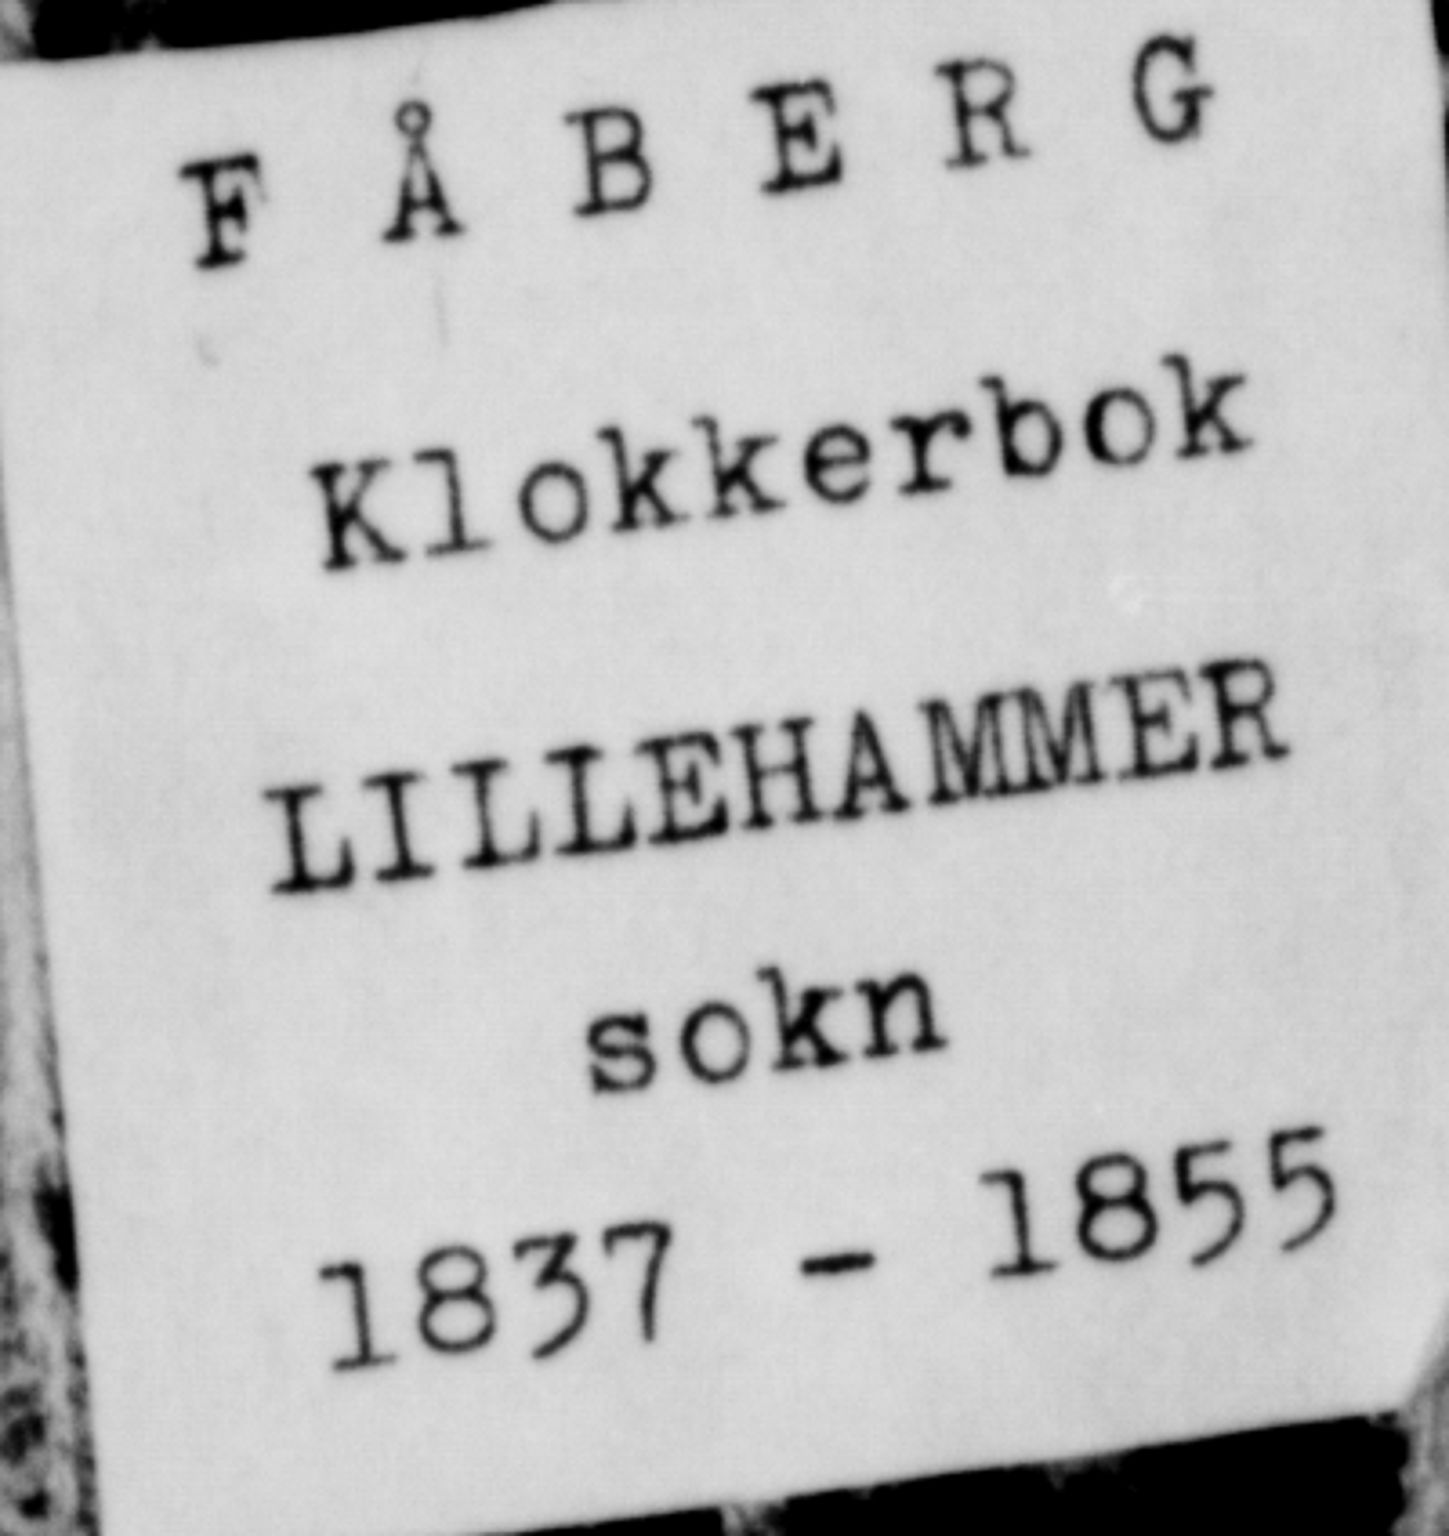 SAH, Fåberg prestekontor, Klokkerbok nr. 6, 1837-1855